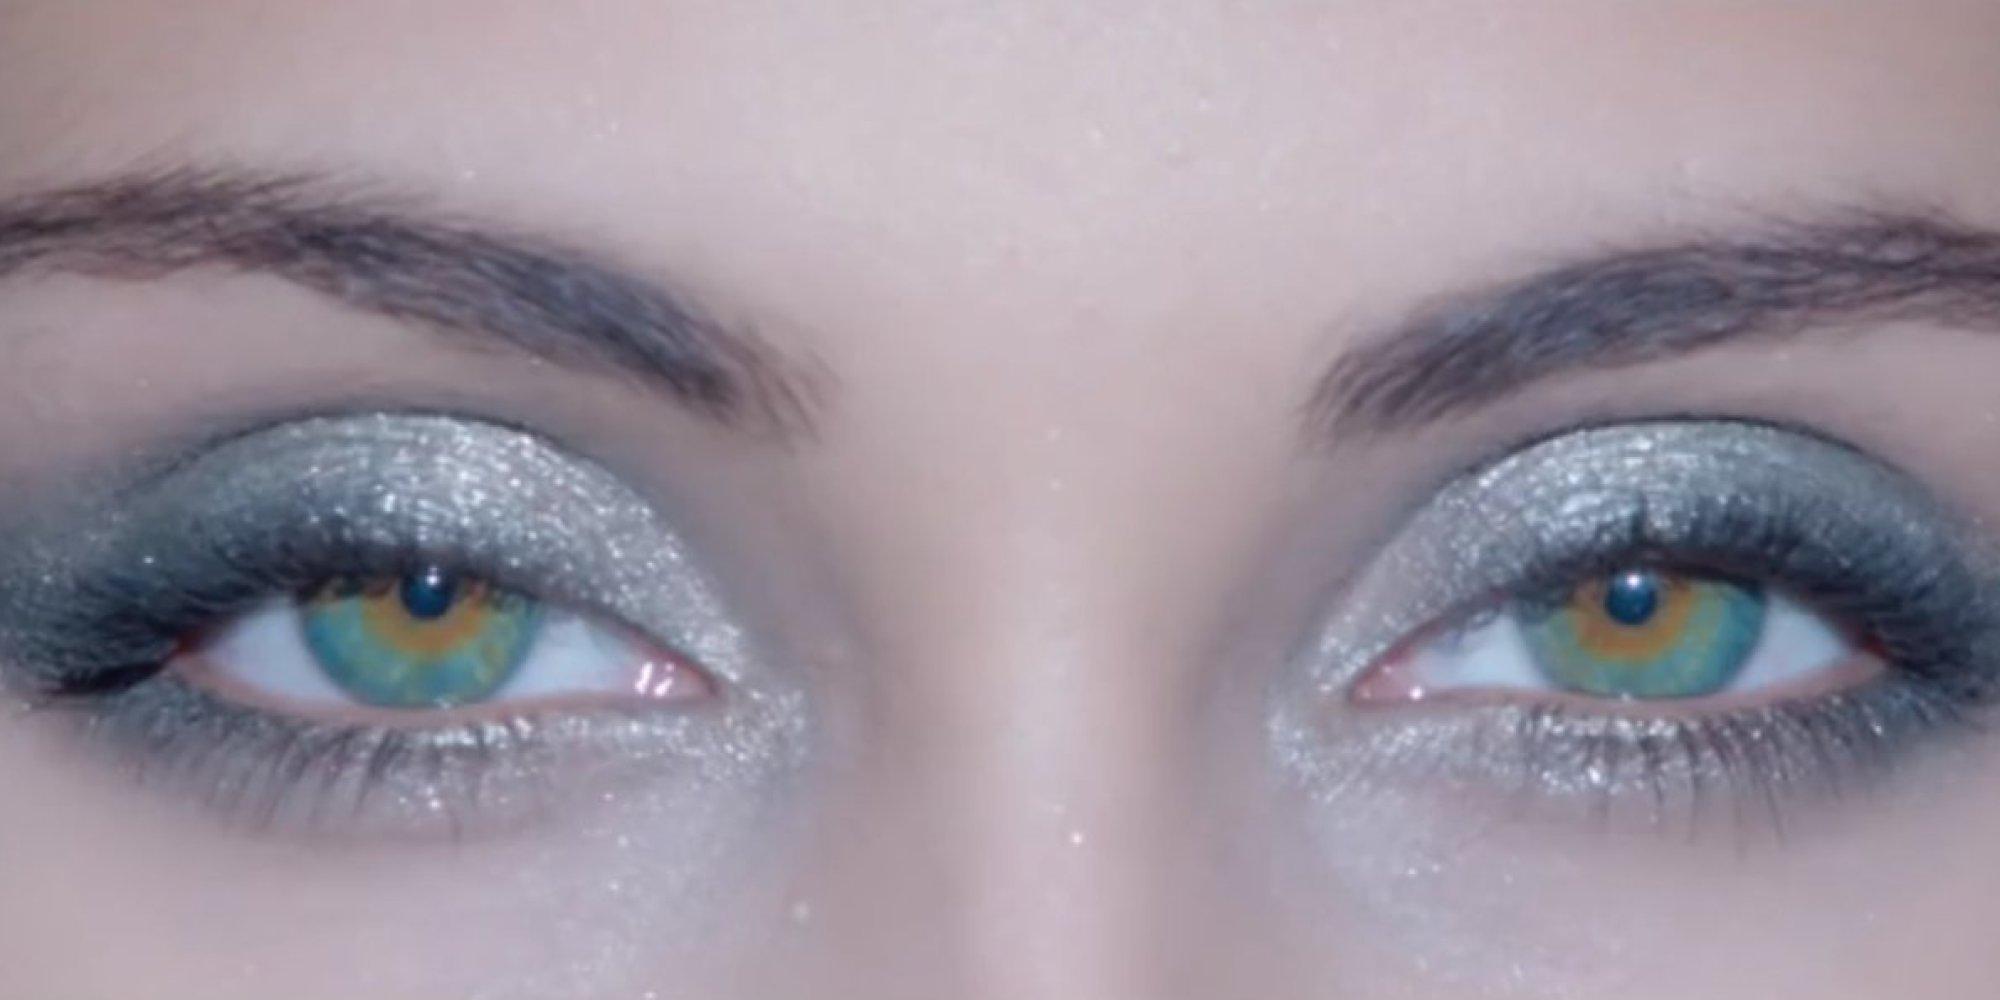 Giorgio Armani Beauty Eye Tint Gives Eyes Glamorous Studio